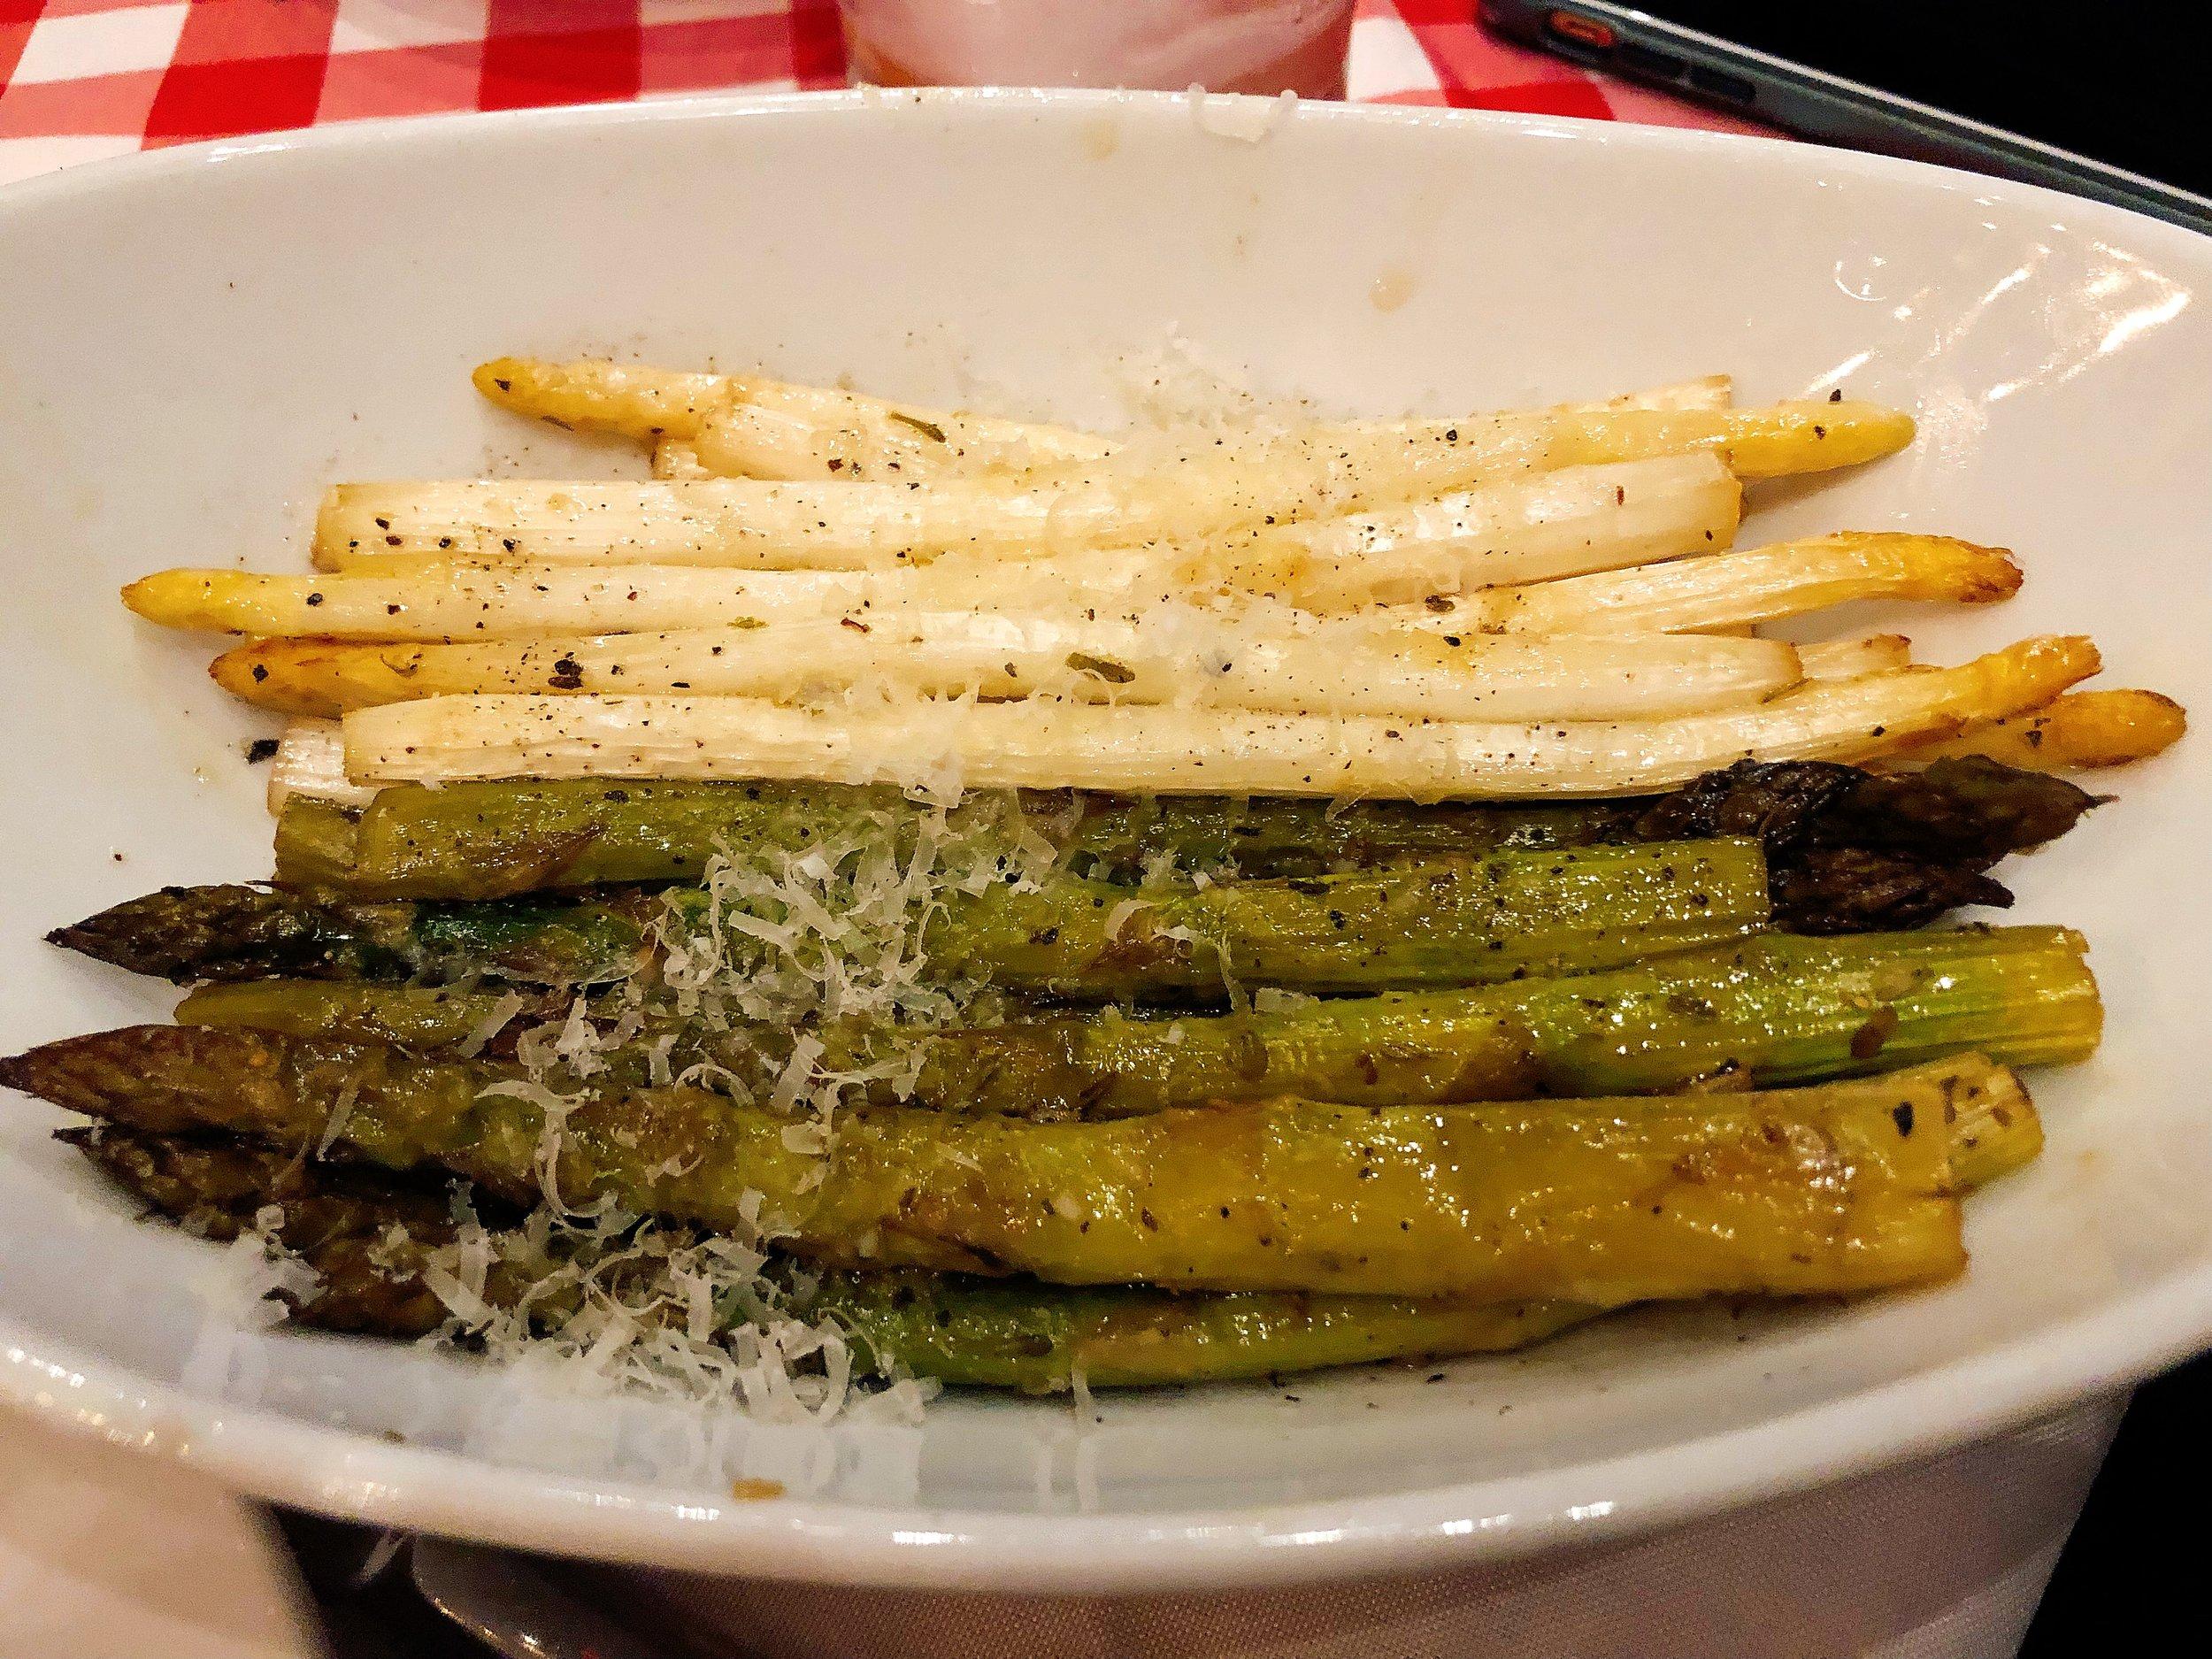 Lemon + Garlic Bourbon Smoked Green + White Asparagus